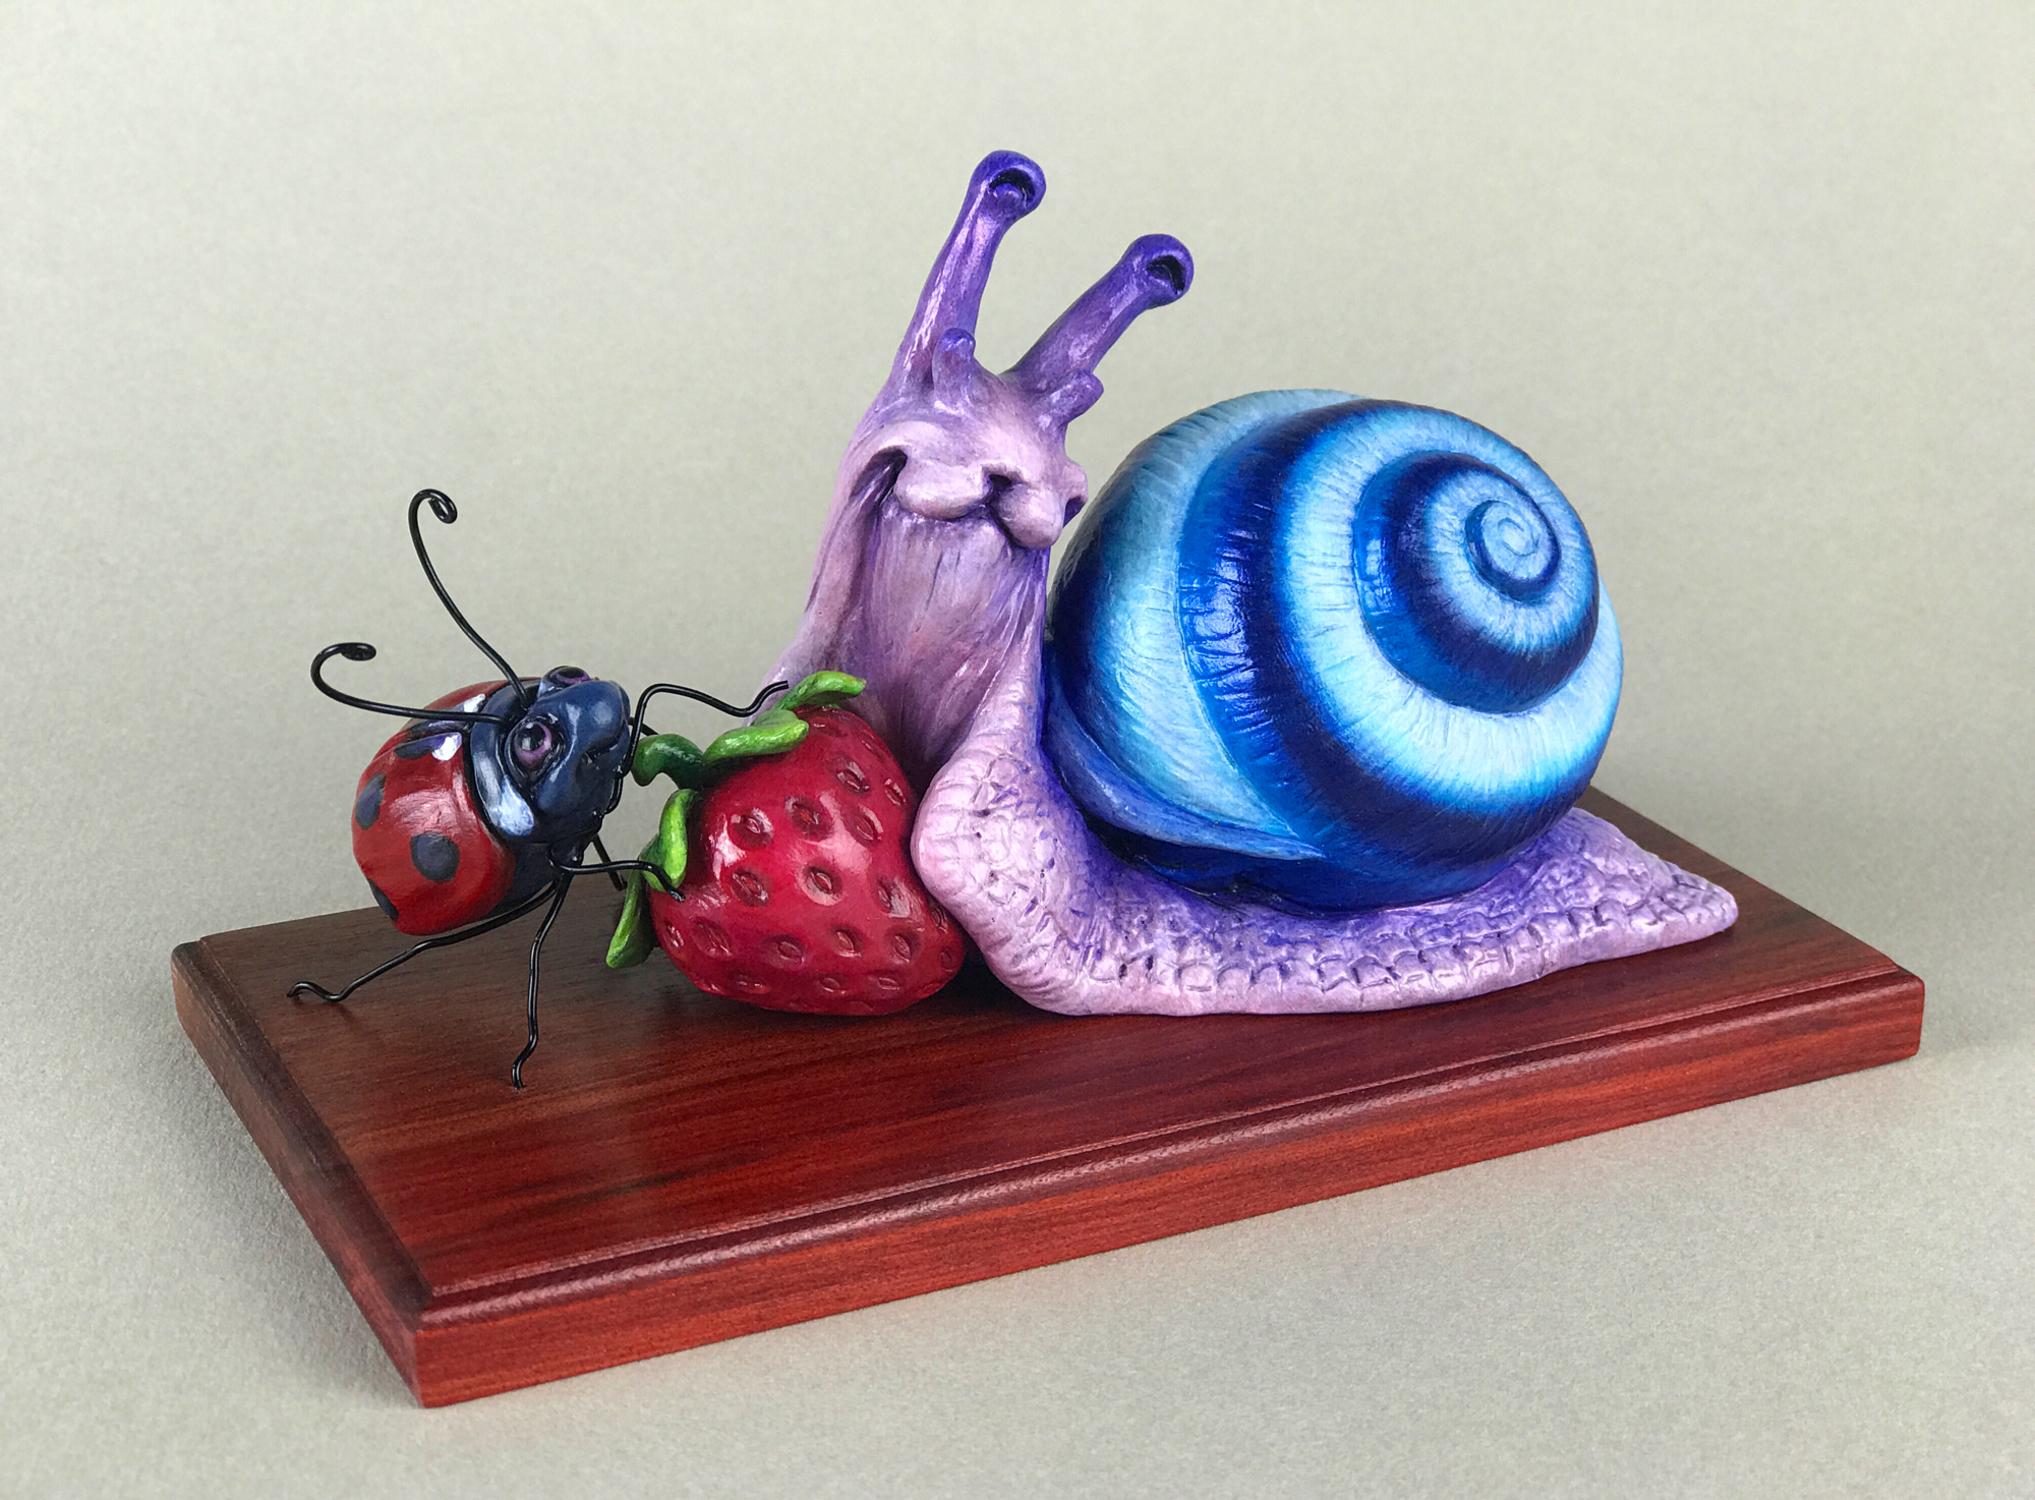 Berry Snacks are Best Snacks Artwork by Erica Lyn Schmidt